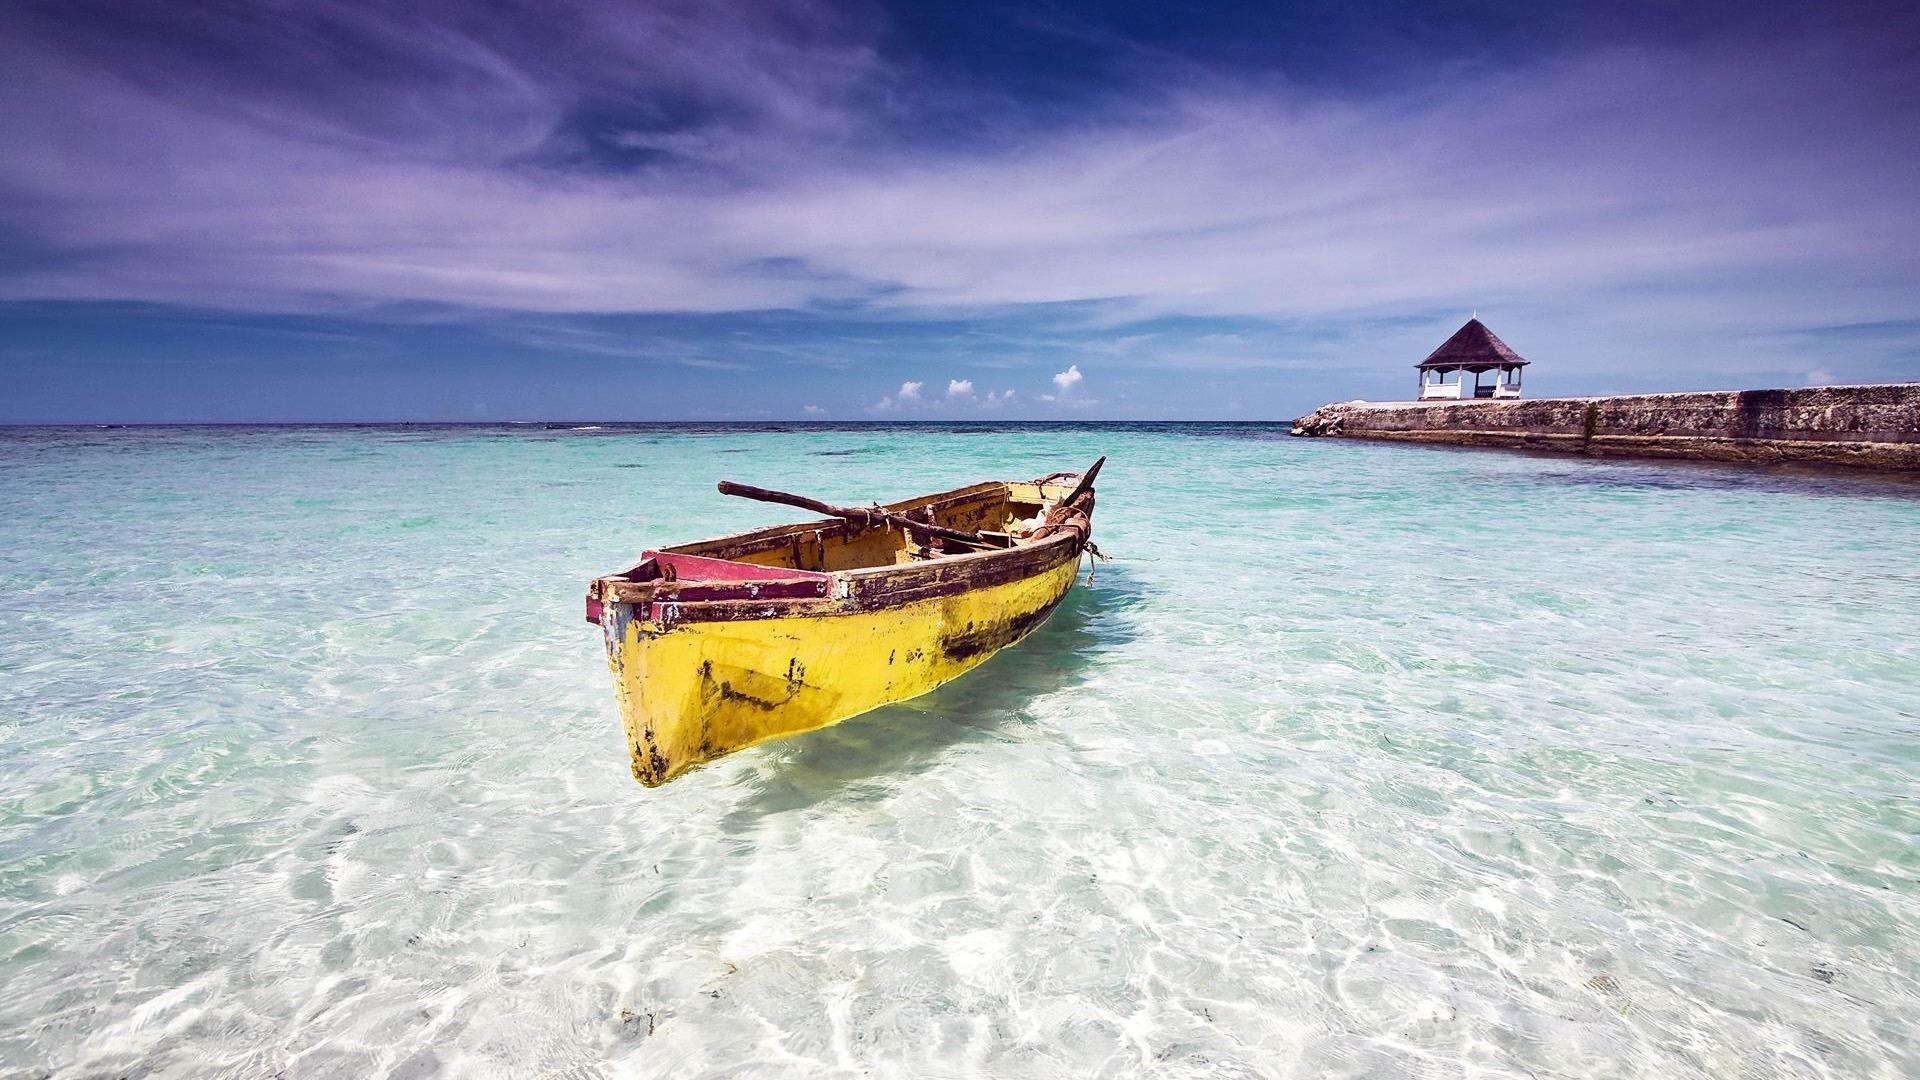 Caribbean_coastline-2012_landscape_Featured_Wallpaper_1920x1080.jpg